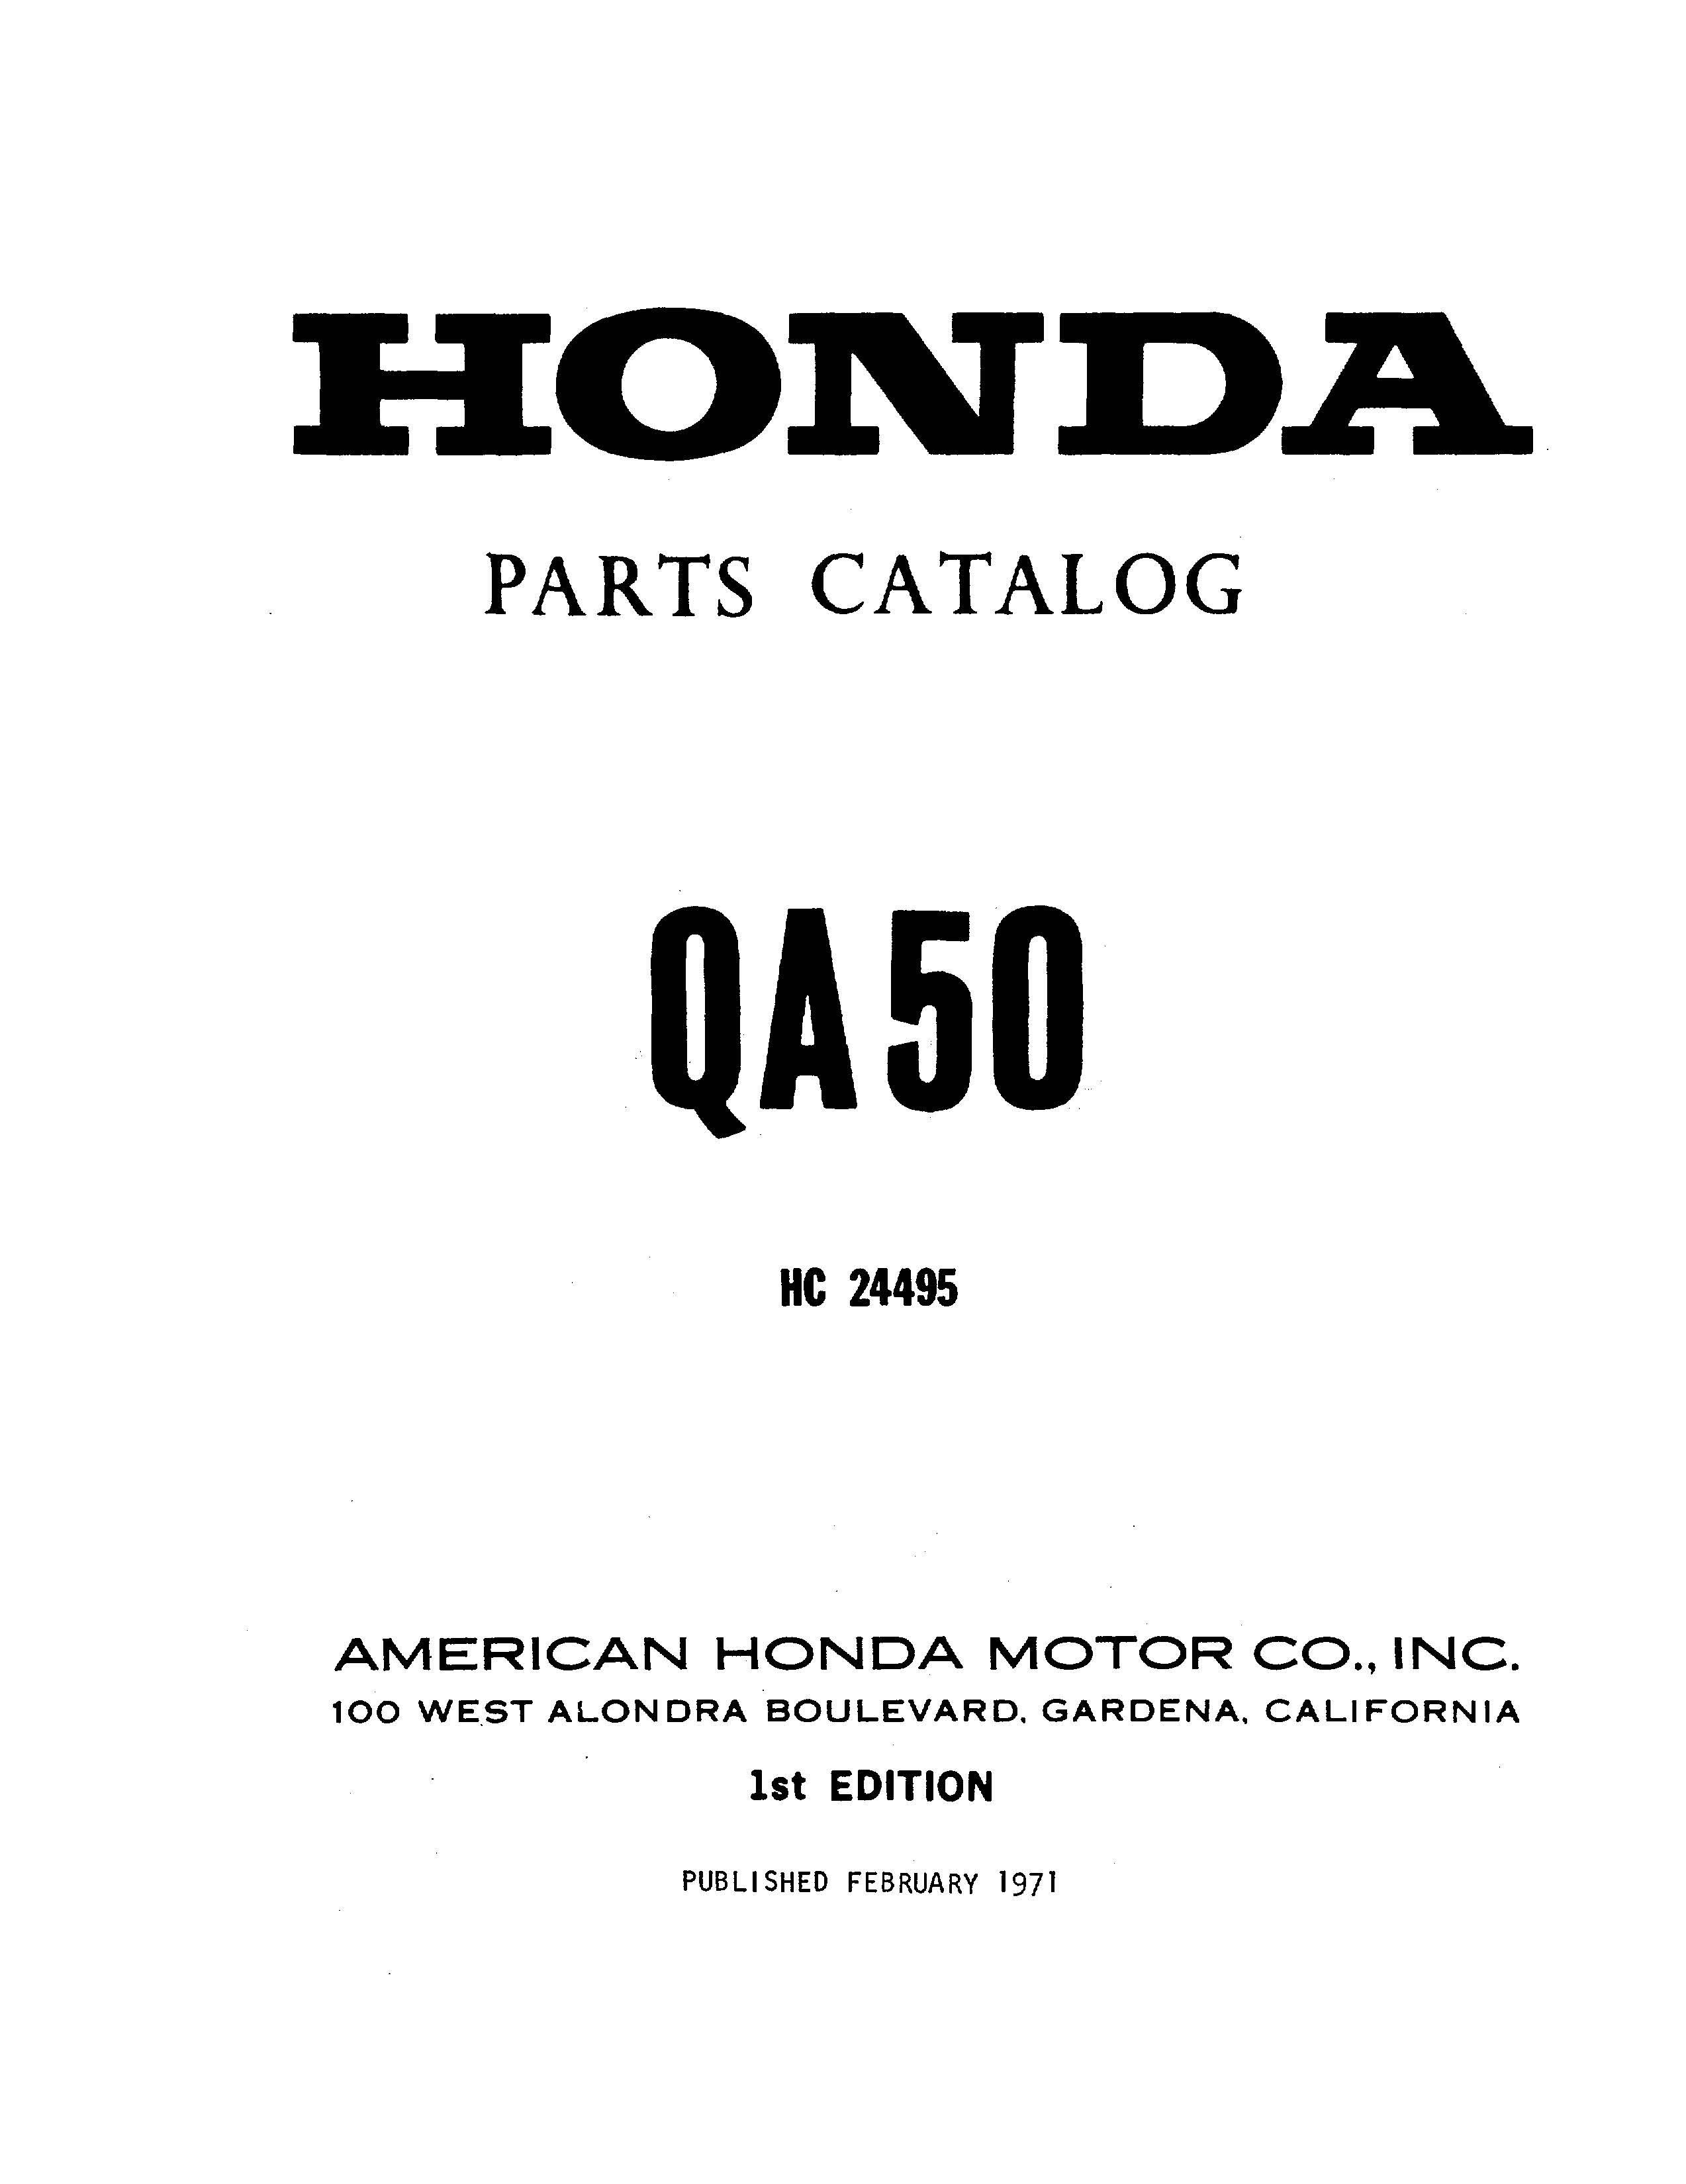 Parts list for Honda QA50 (1971)